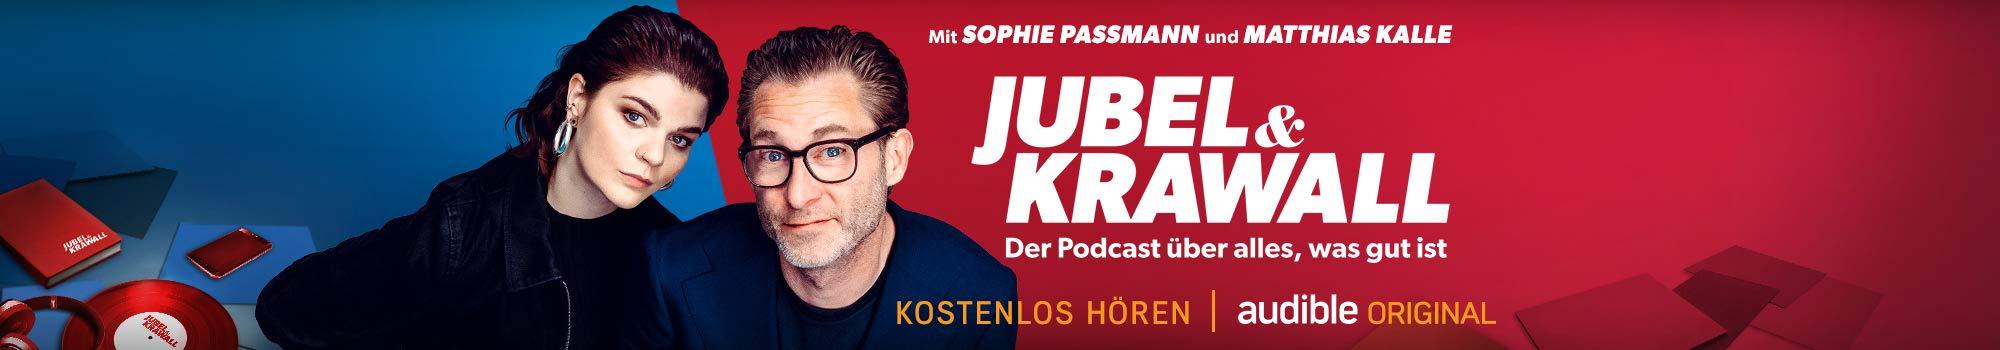 Jubel & Krawall mit Sophie Passmann und Matthias Kalle - Audible Original Podcast